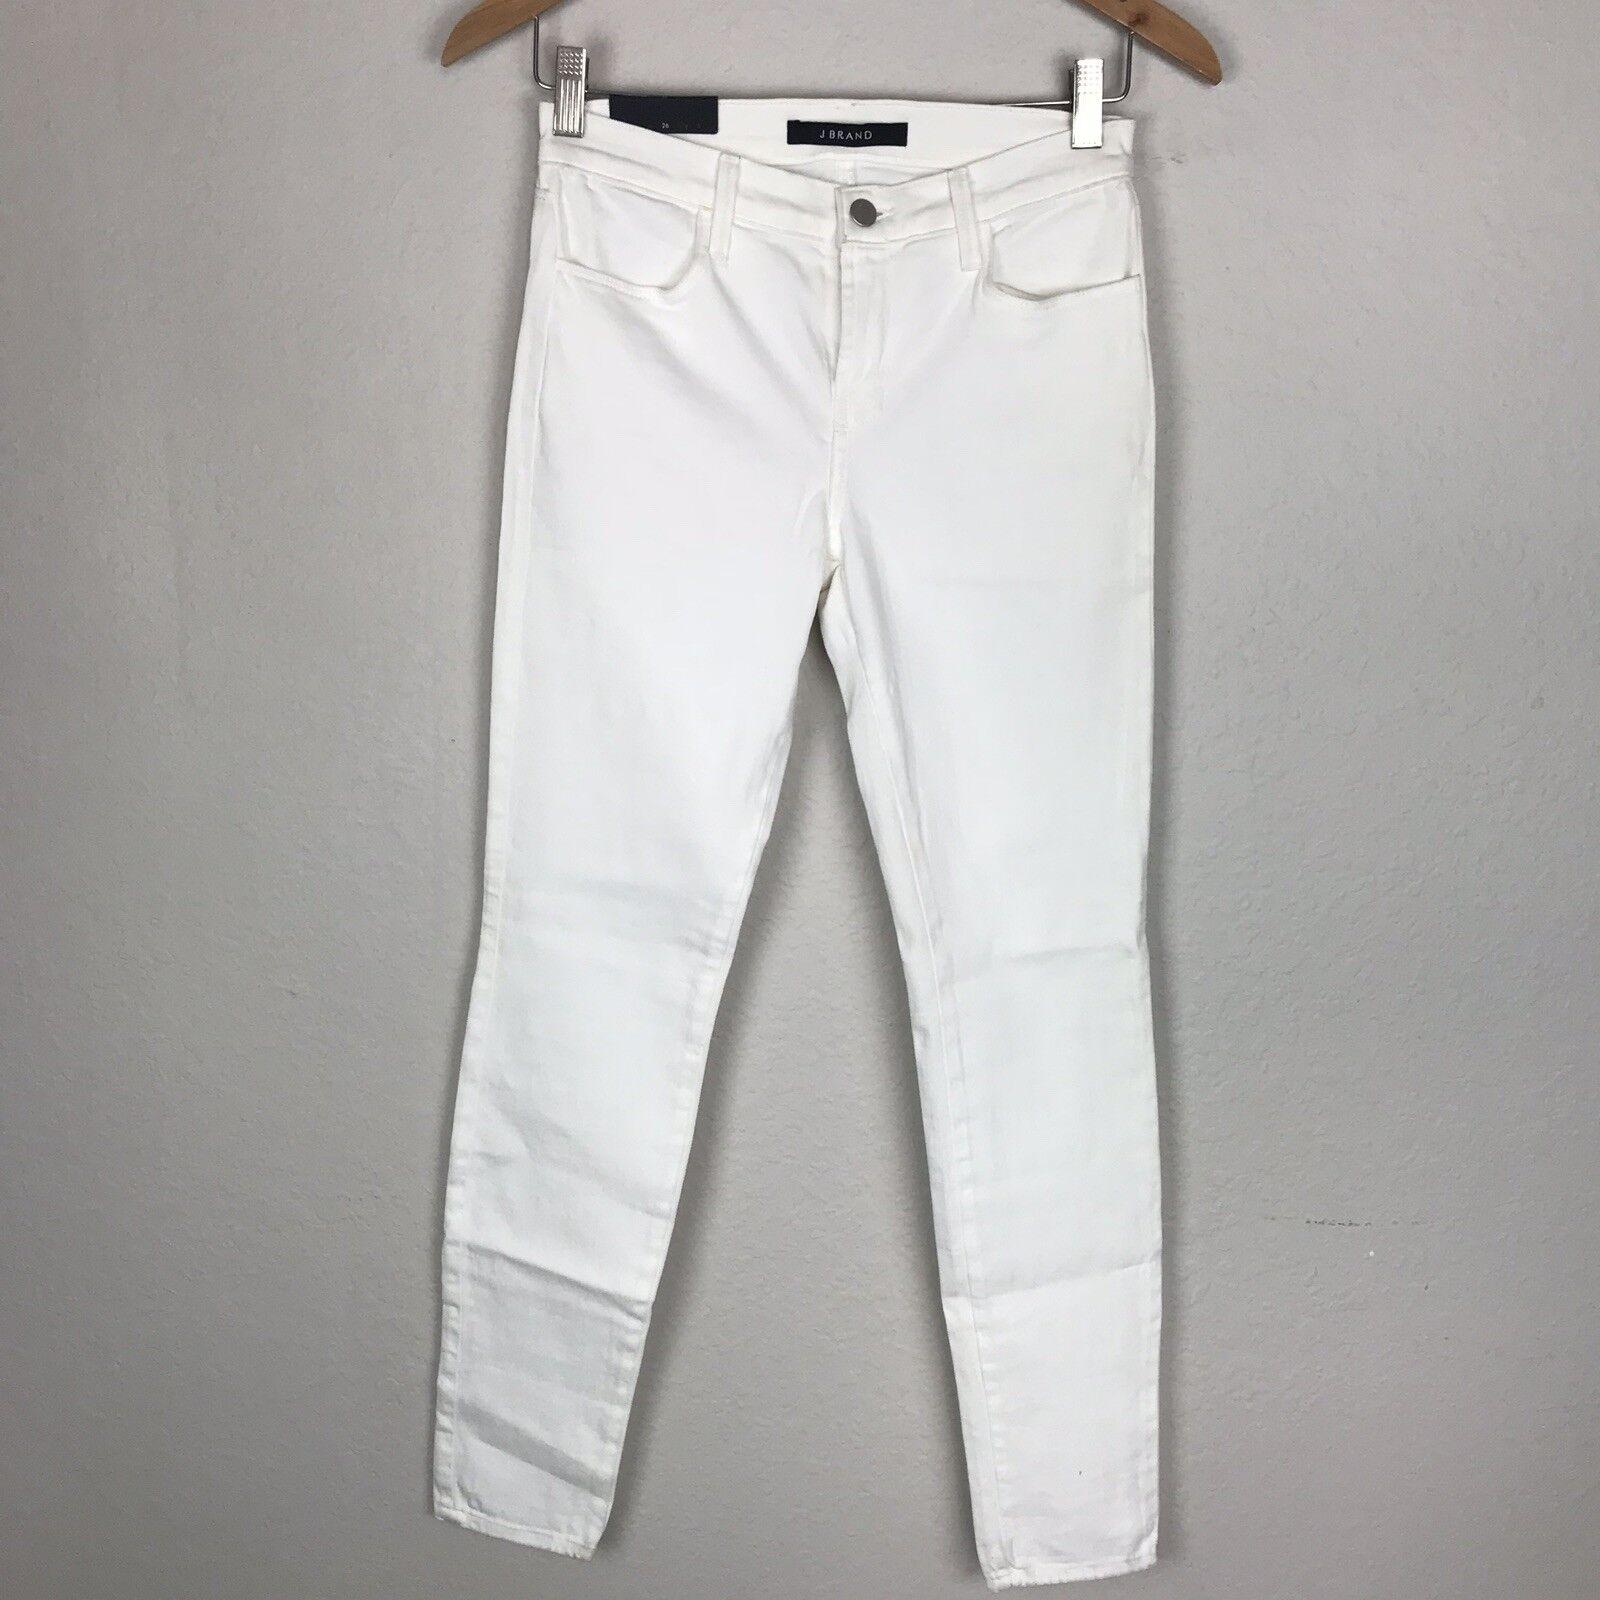 J Brand Super Skinny White Jeans Womens Size 26 Casual Full Length